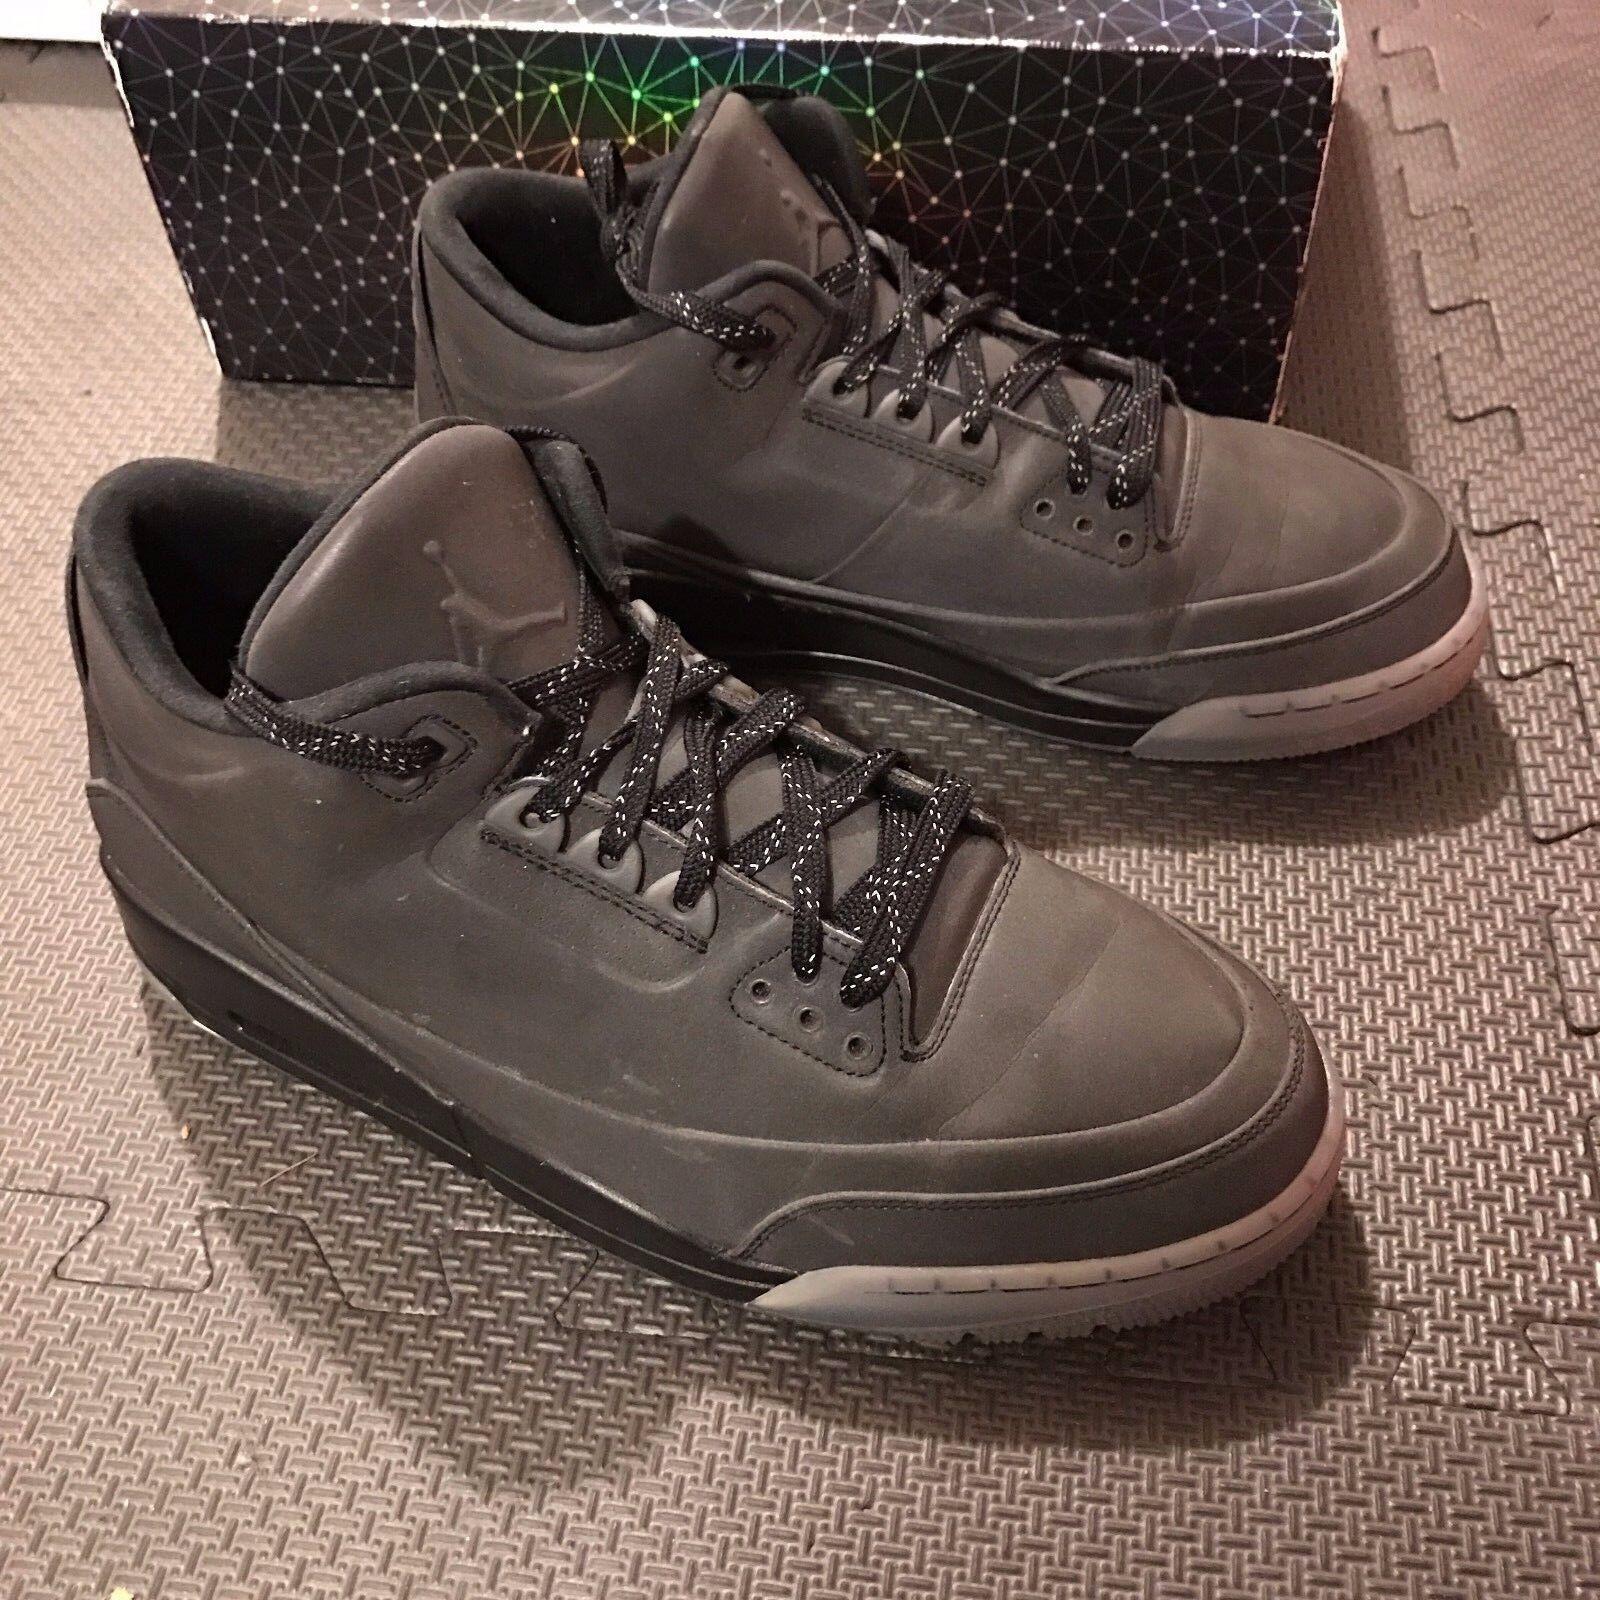 Nike Air Jordan 5lab3 631603 010 US Hombre SZ descuento 10,5 NEGRO 3M gran descuento SZ c20eaf